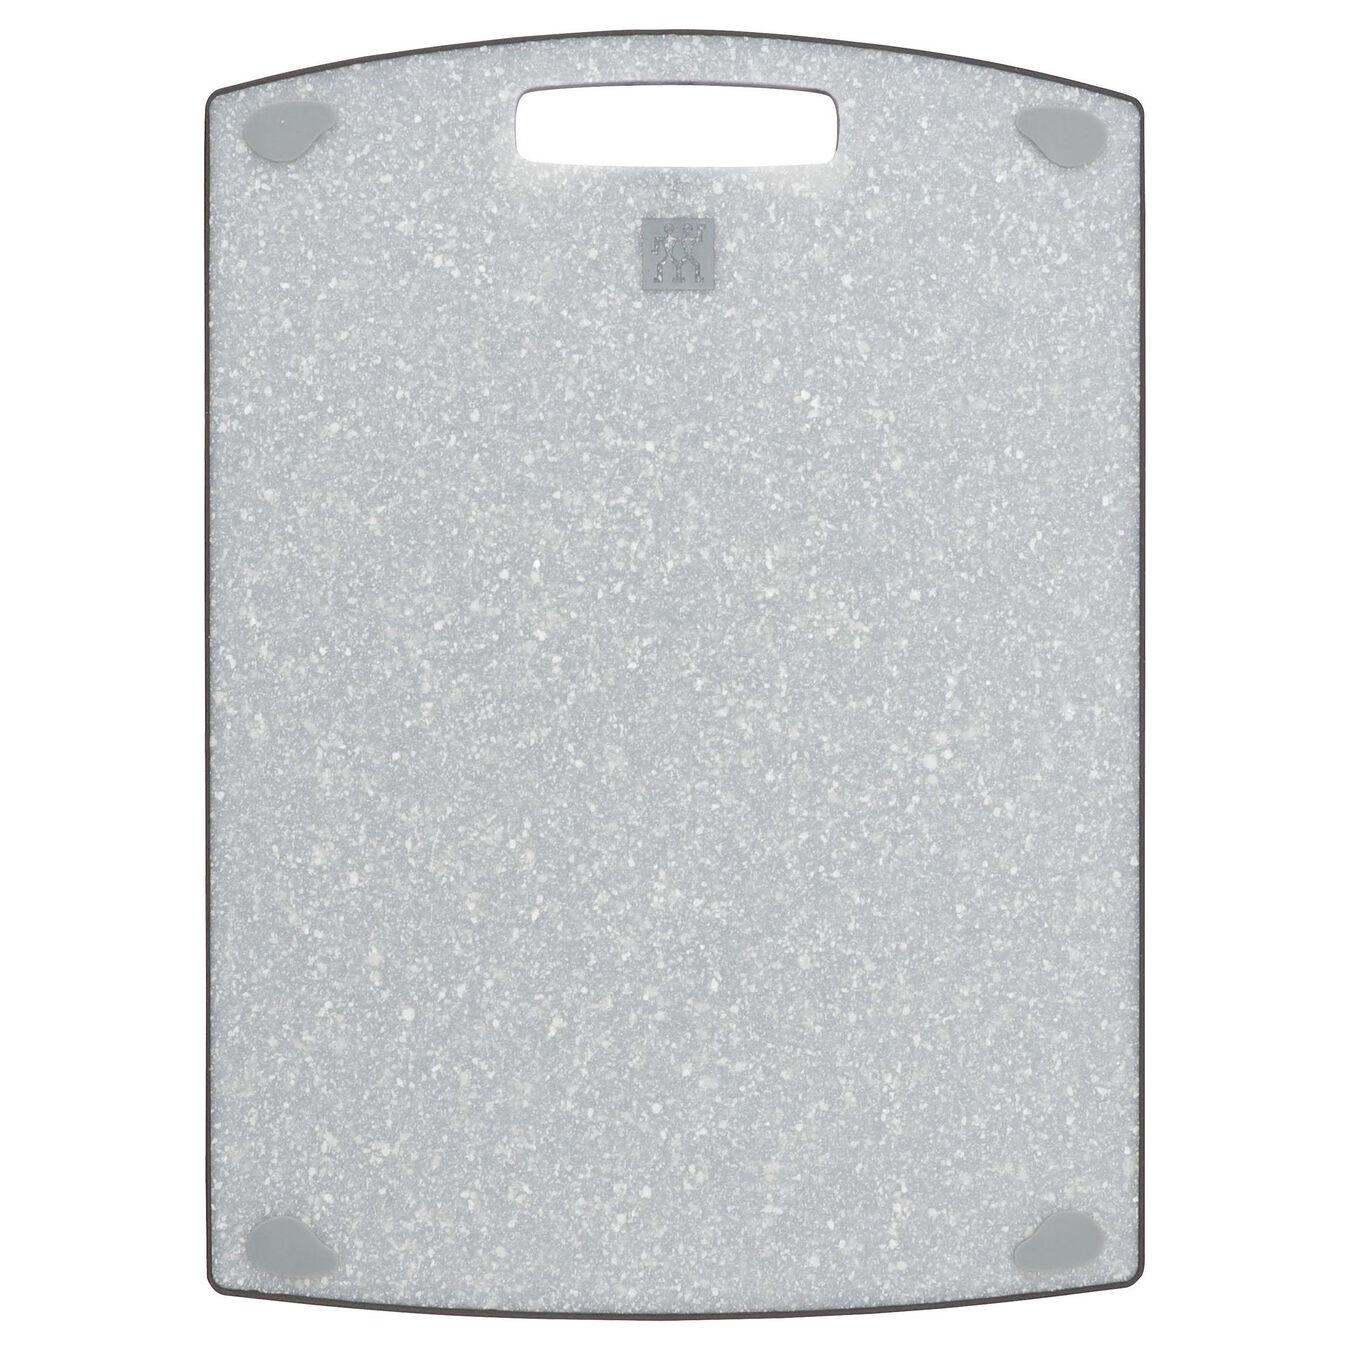 2 pc. Cutting board set, Plastic | 36 cm x 20 cm & 37 cm x 27 cm 36 cm x 20 cm,,large 5